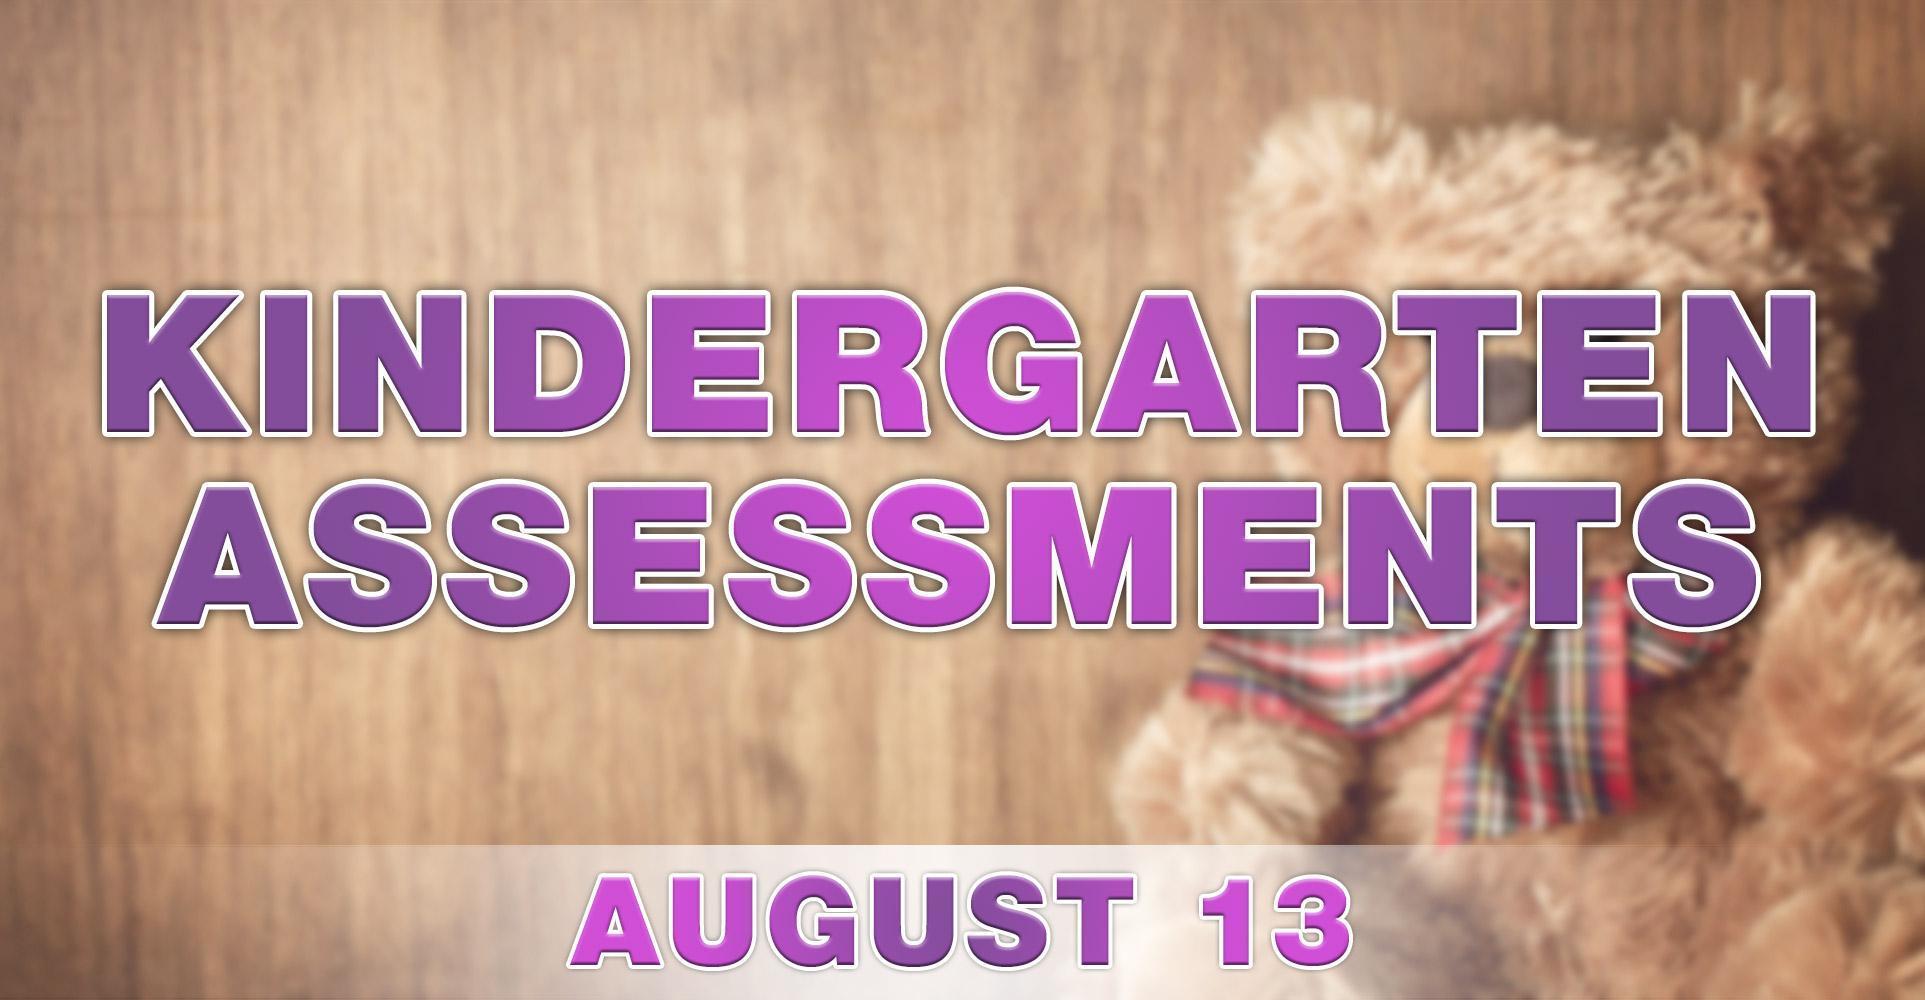 Kindergarten Assessments on August 13